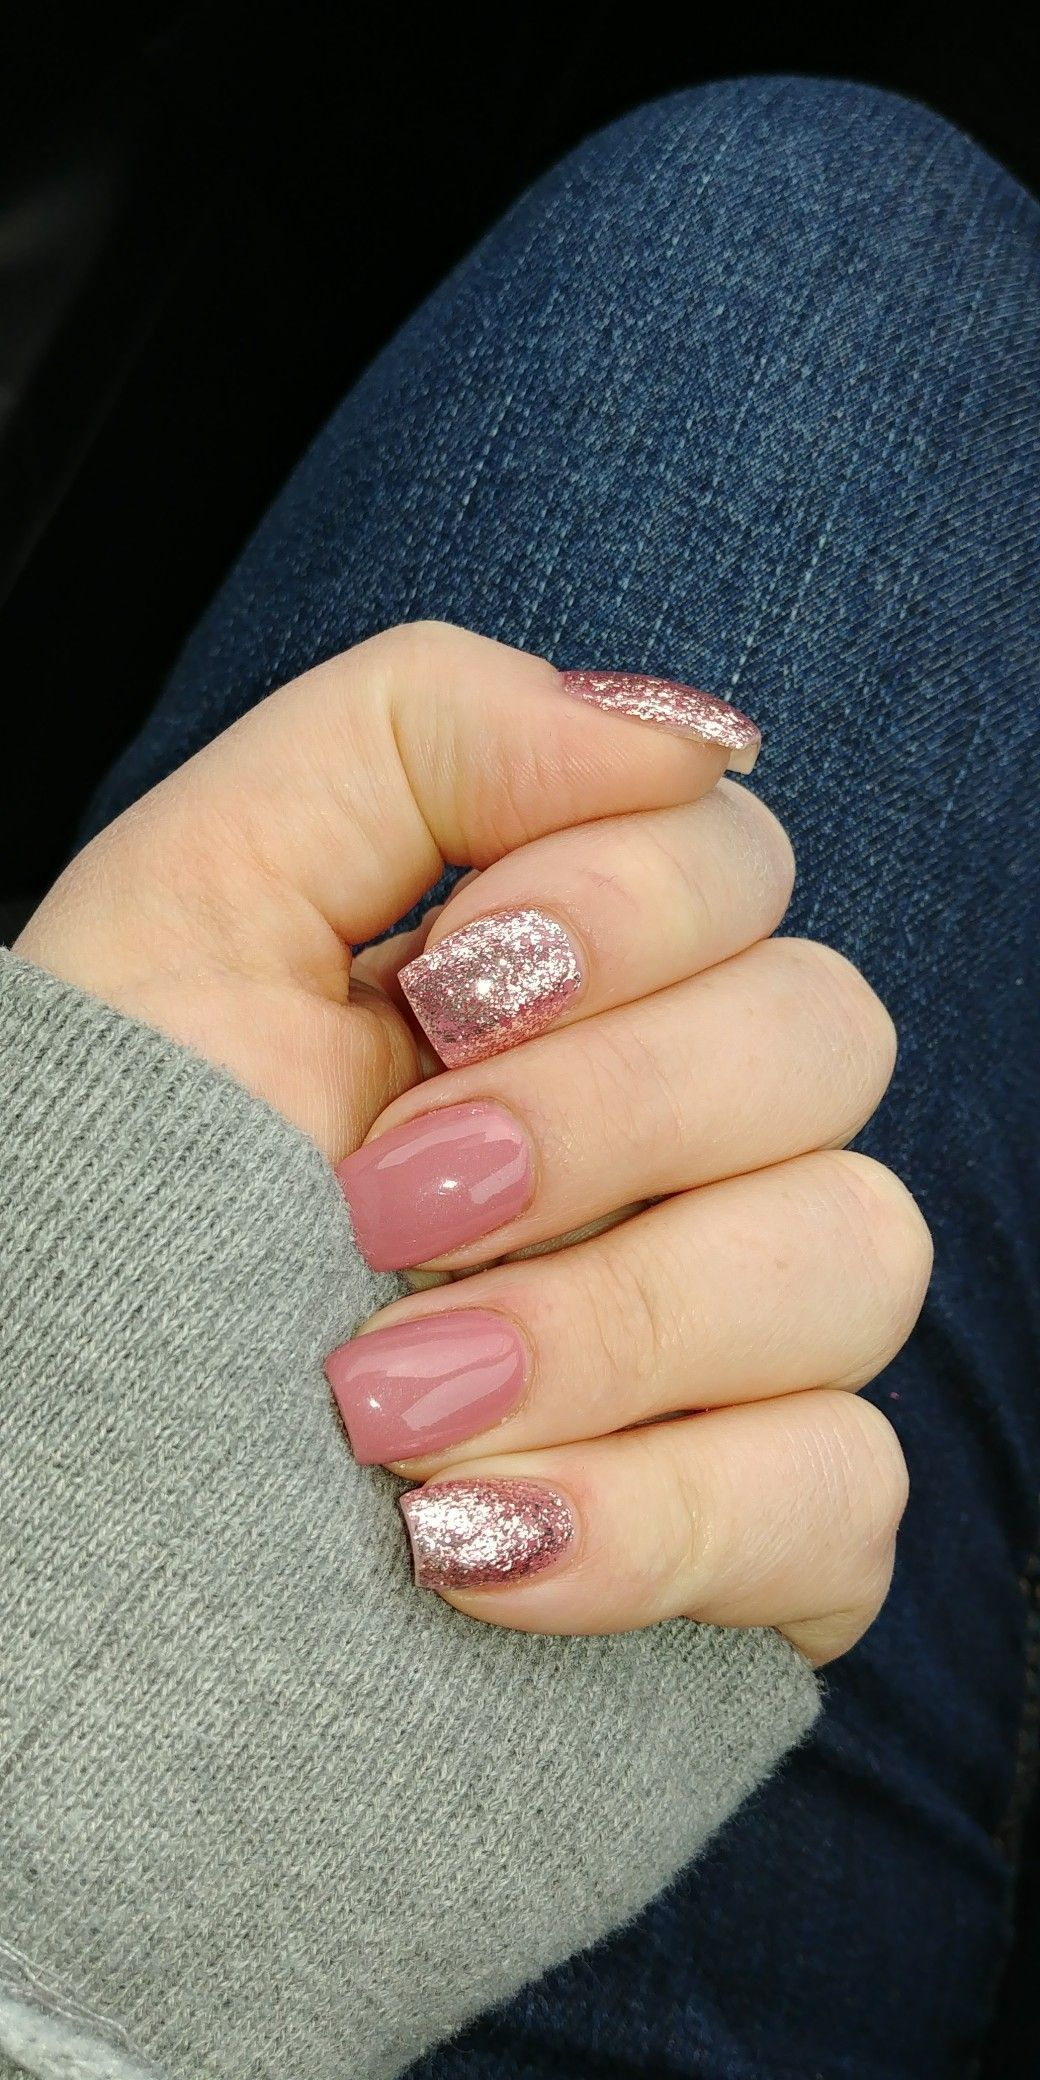 Acrylic nails pink sparkle short acrylicnails glitternails